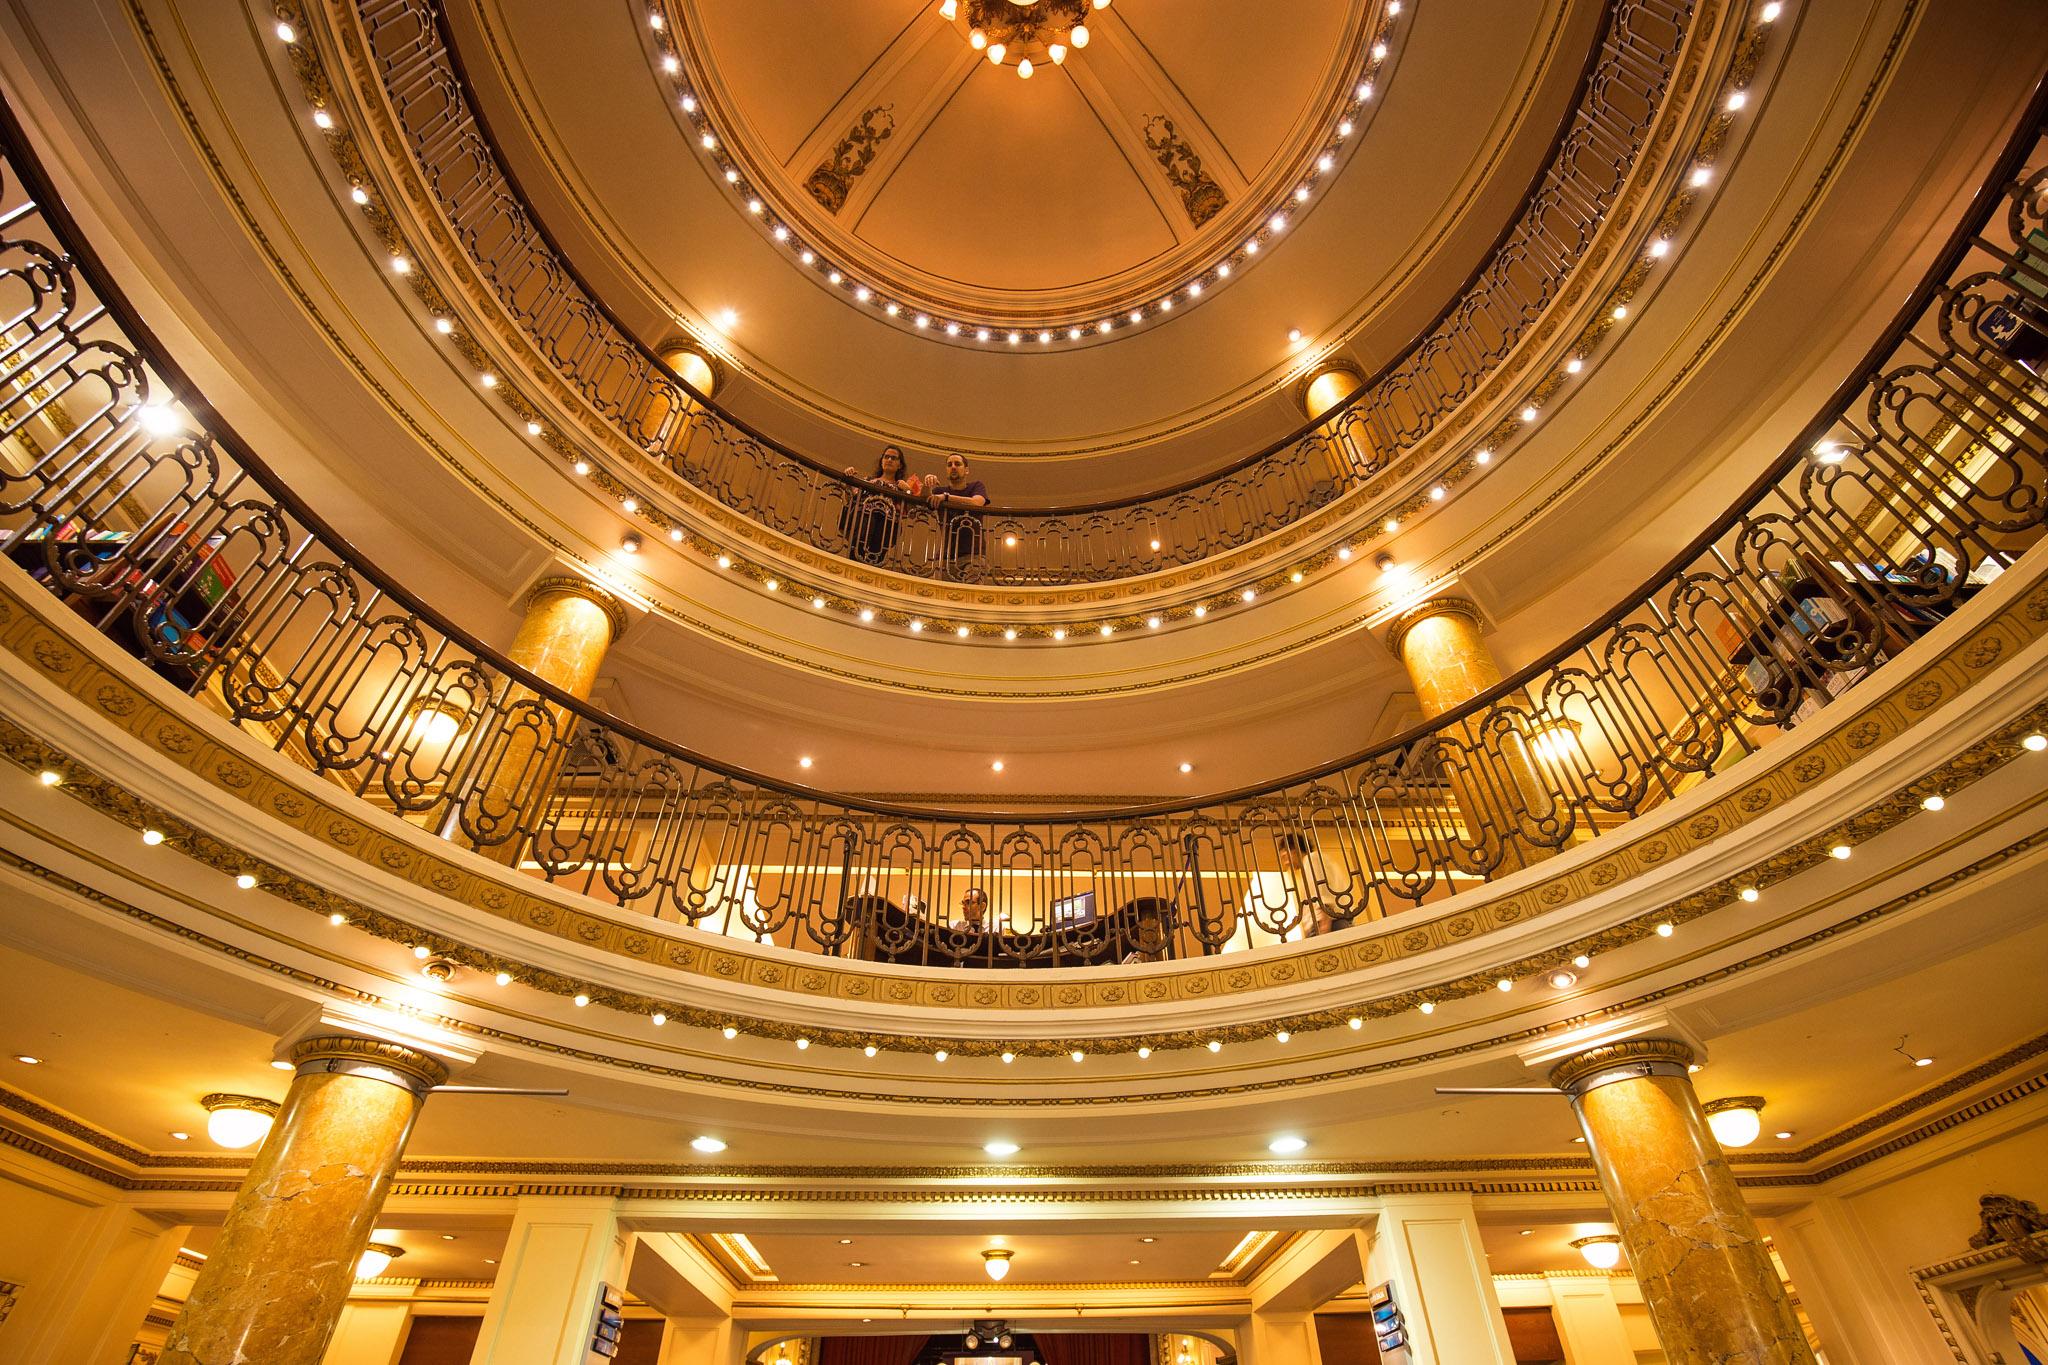 Wedding-travellers-Argentina-Buenos-Aires-Bookstore-El-Ateneo-Old-Theatre